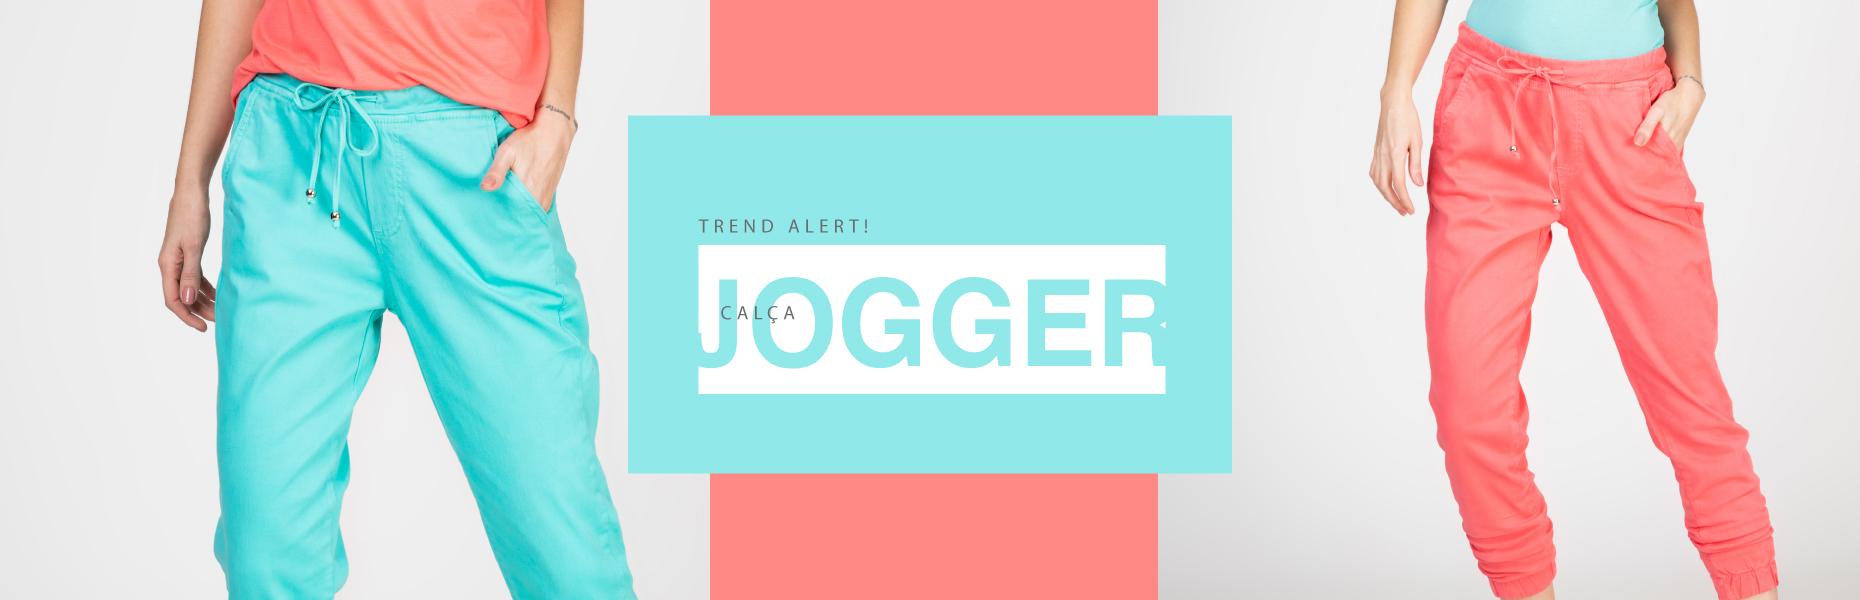 Trend Alert! Calça Jogger - Conforto e estilo sempre!